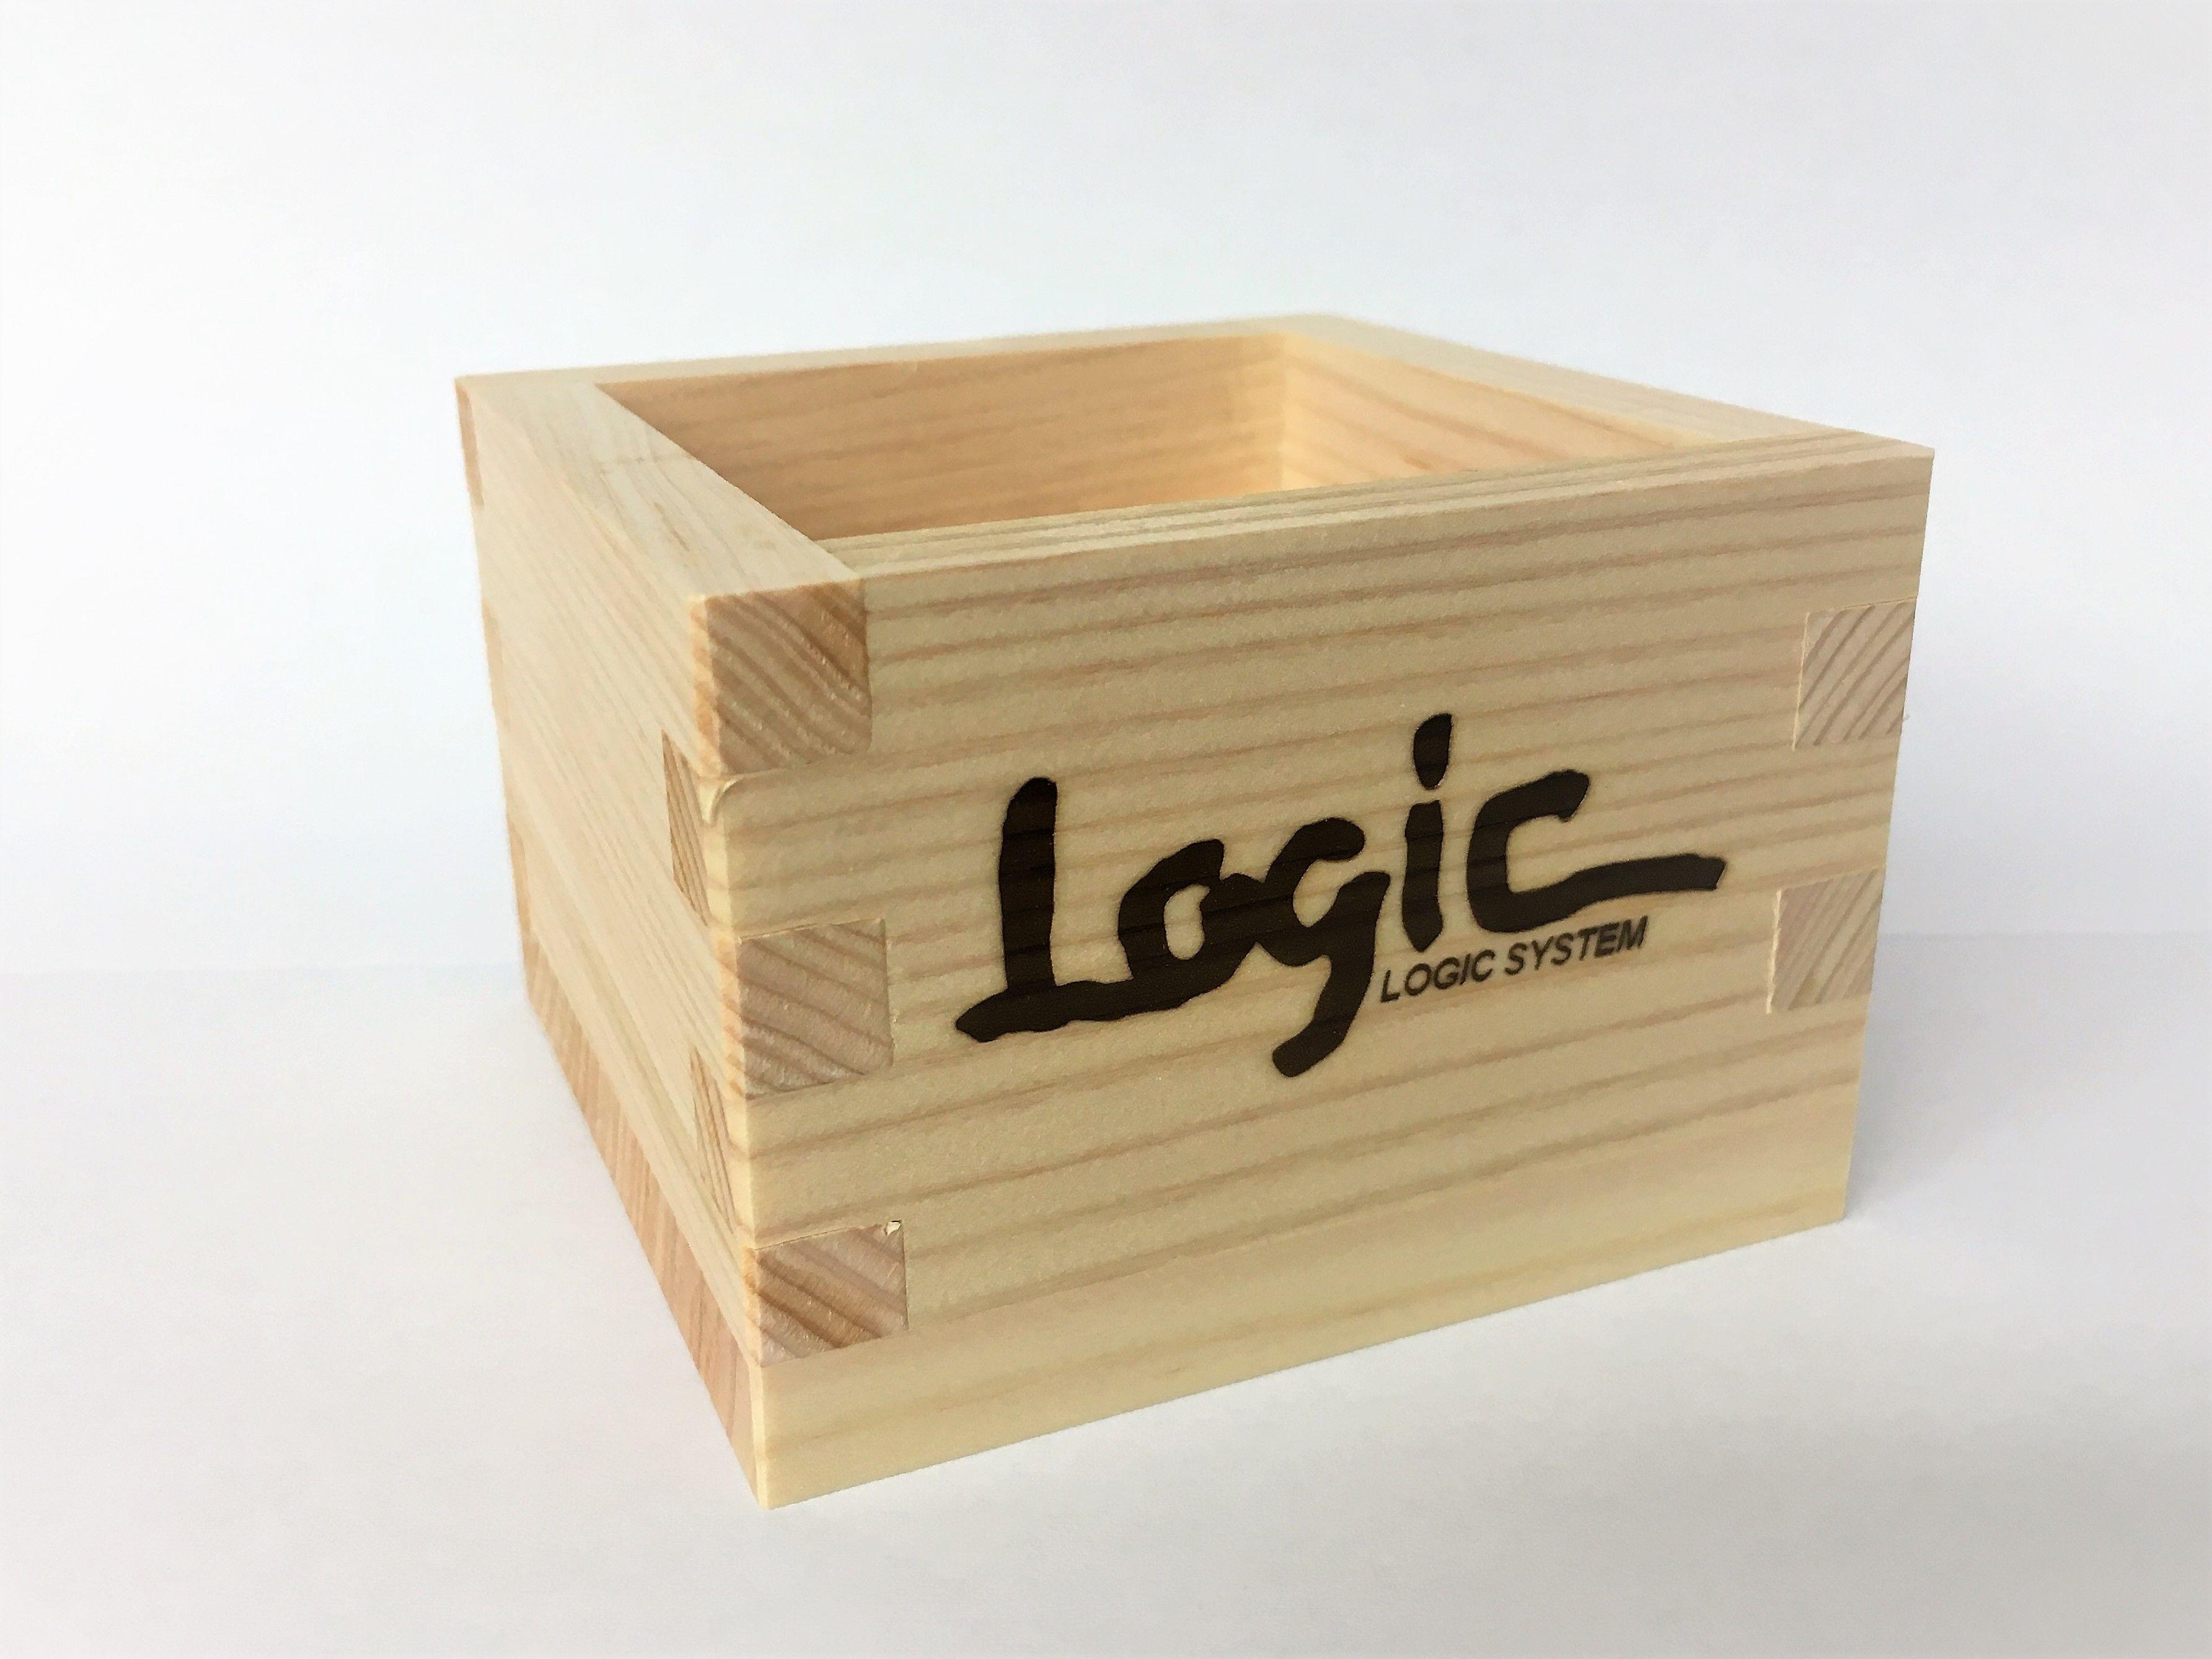 Logic System × 菊姫  一合枡